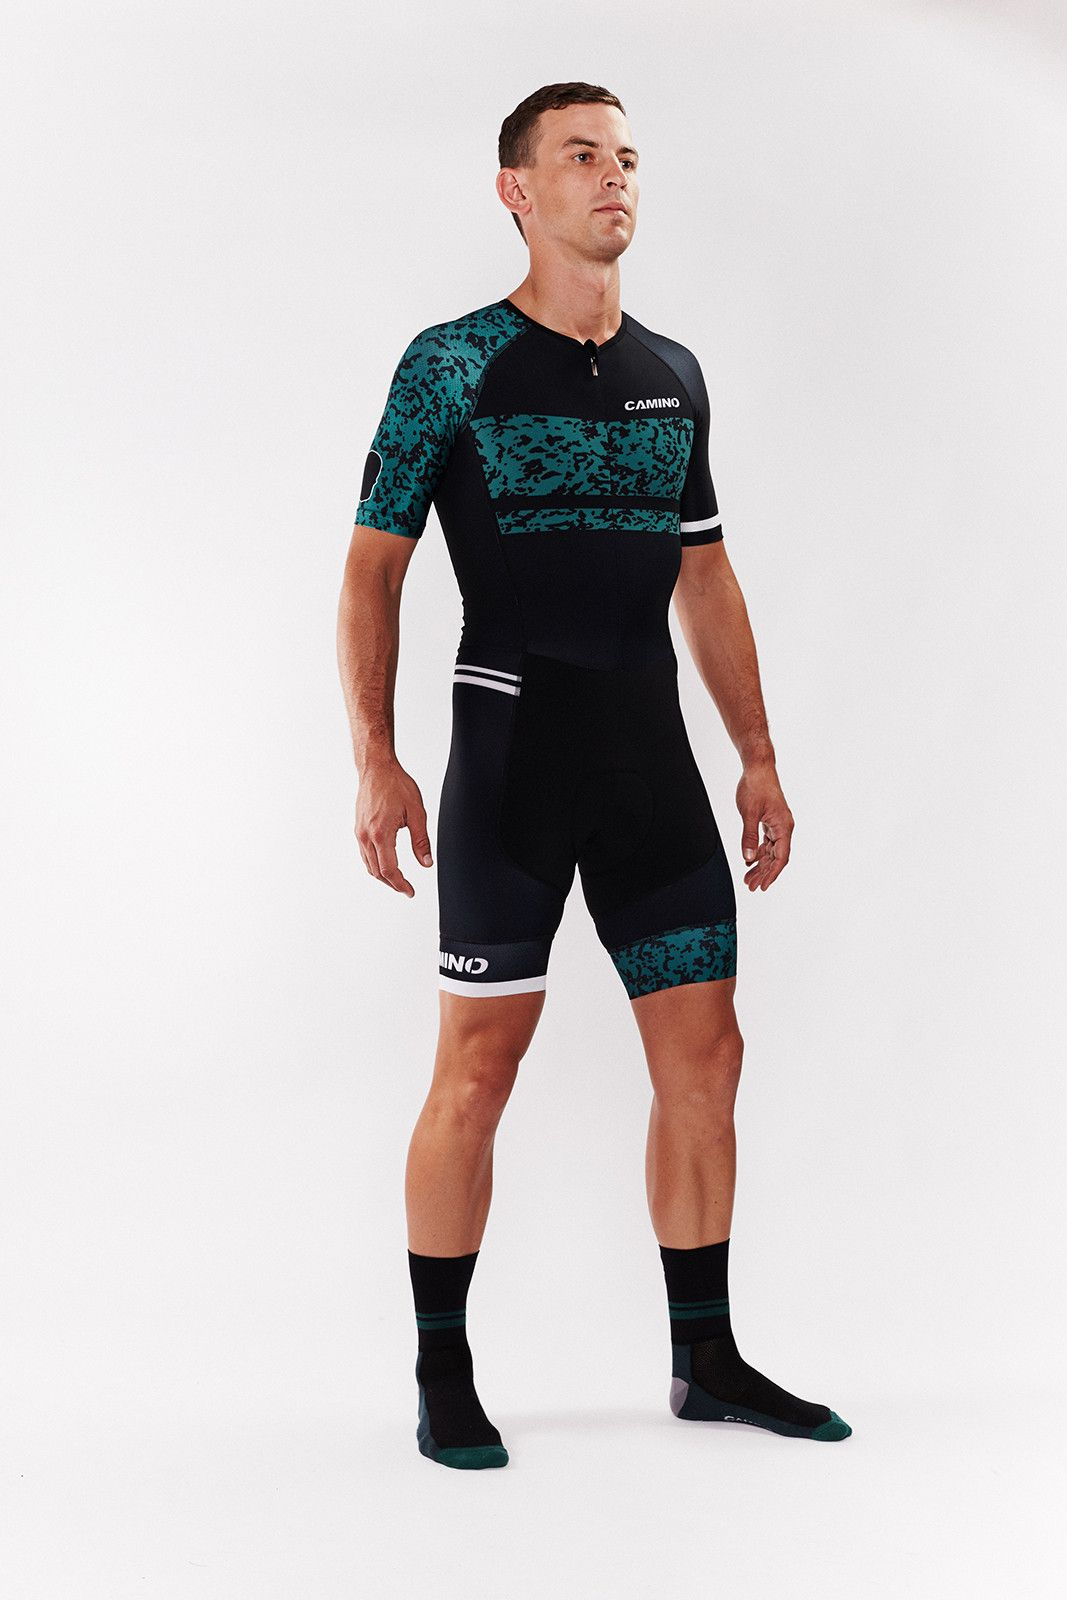 Mens Camo Triathlon Suit Camino Apparel Triathlon Suit